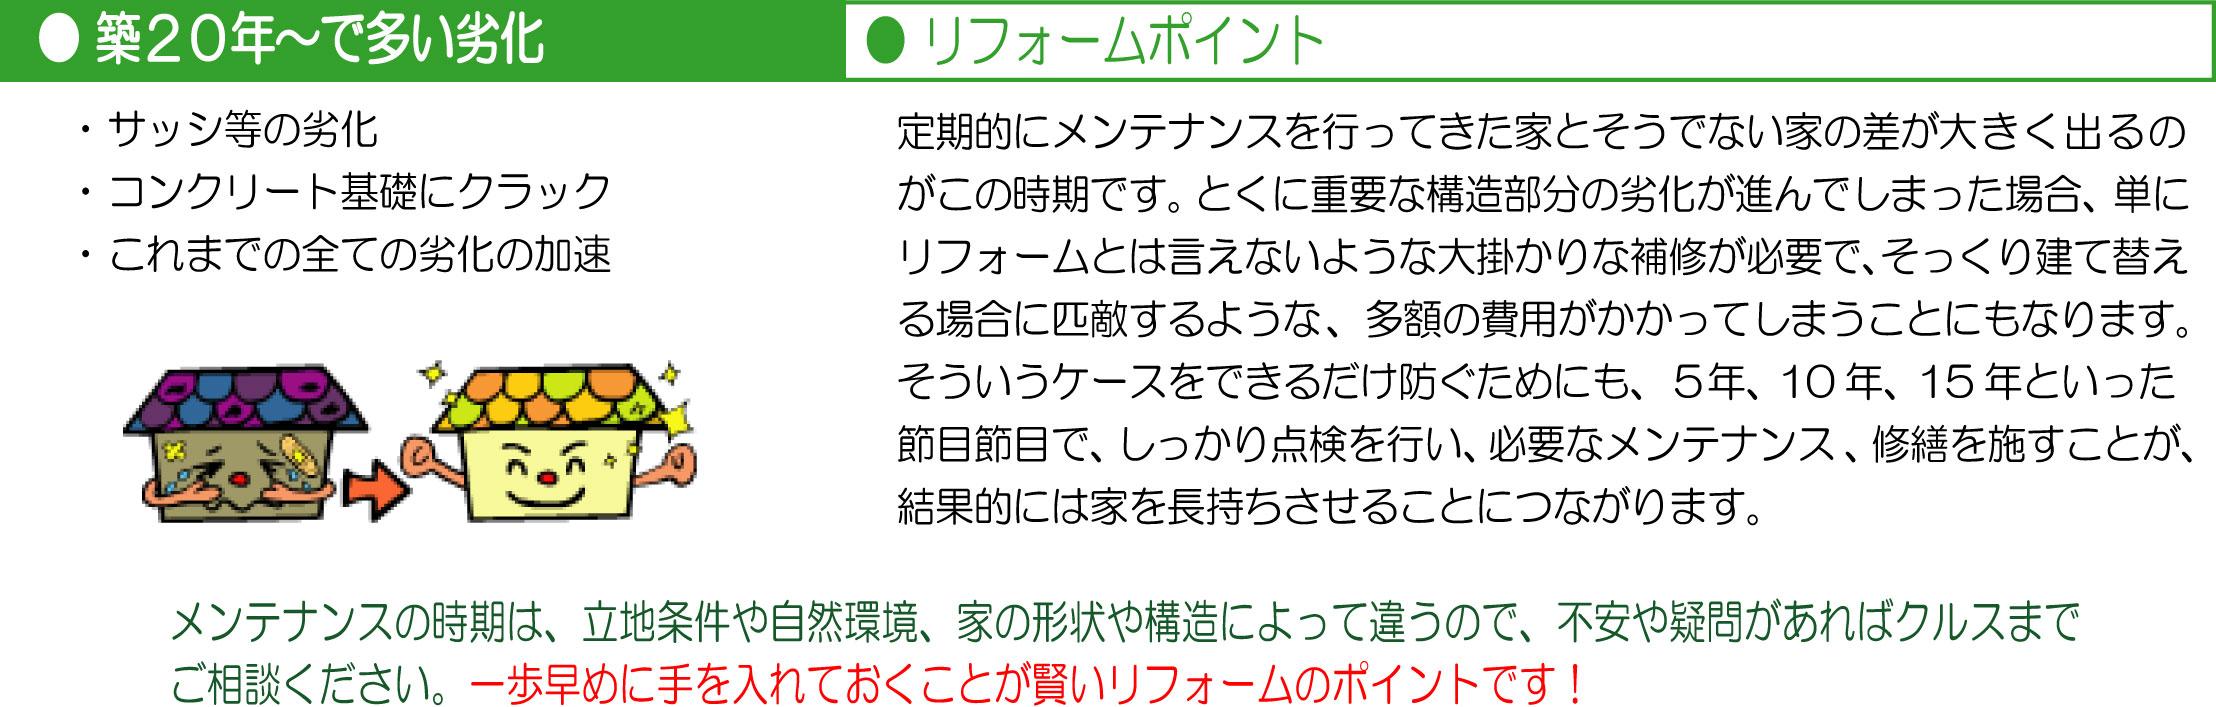 KuraSi-natu-sin65-09.jpg